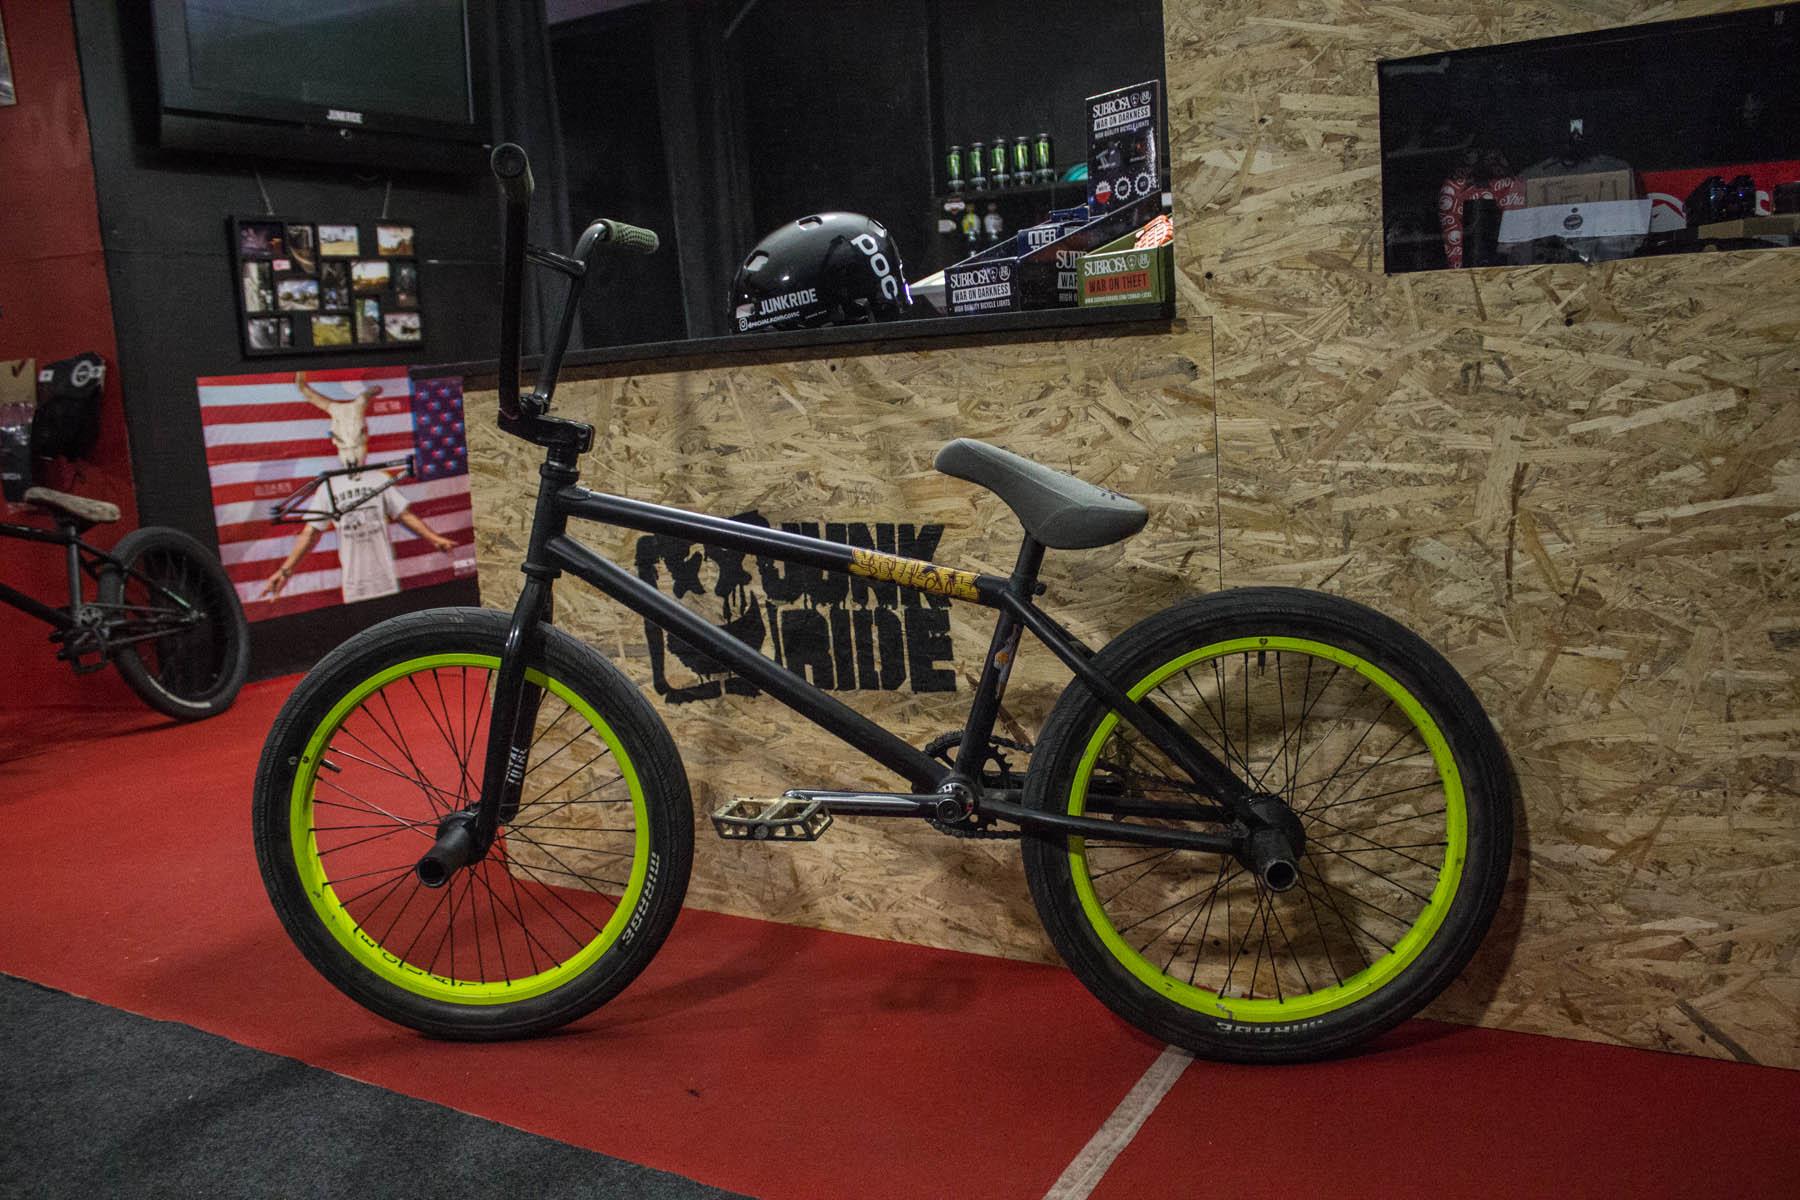 BSD BMX SAFARI ZULU BICYCLE SEAT BROWN ODYSSEY PRIMO CULT STRANGER